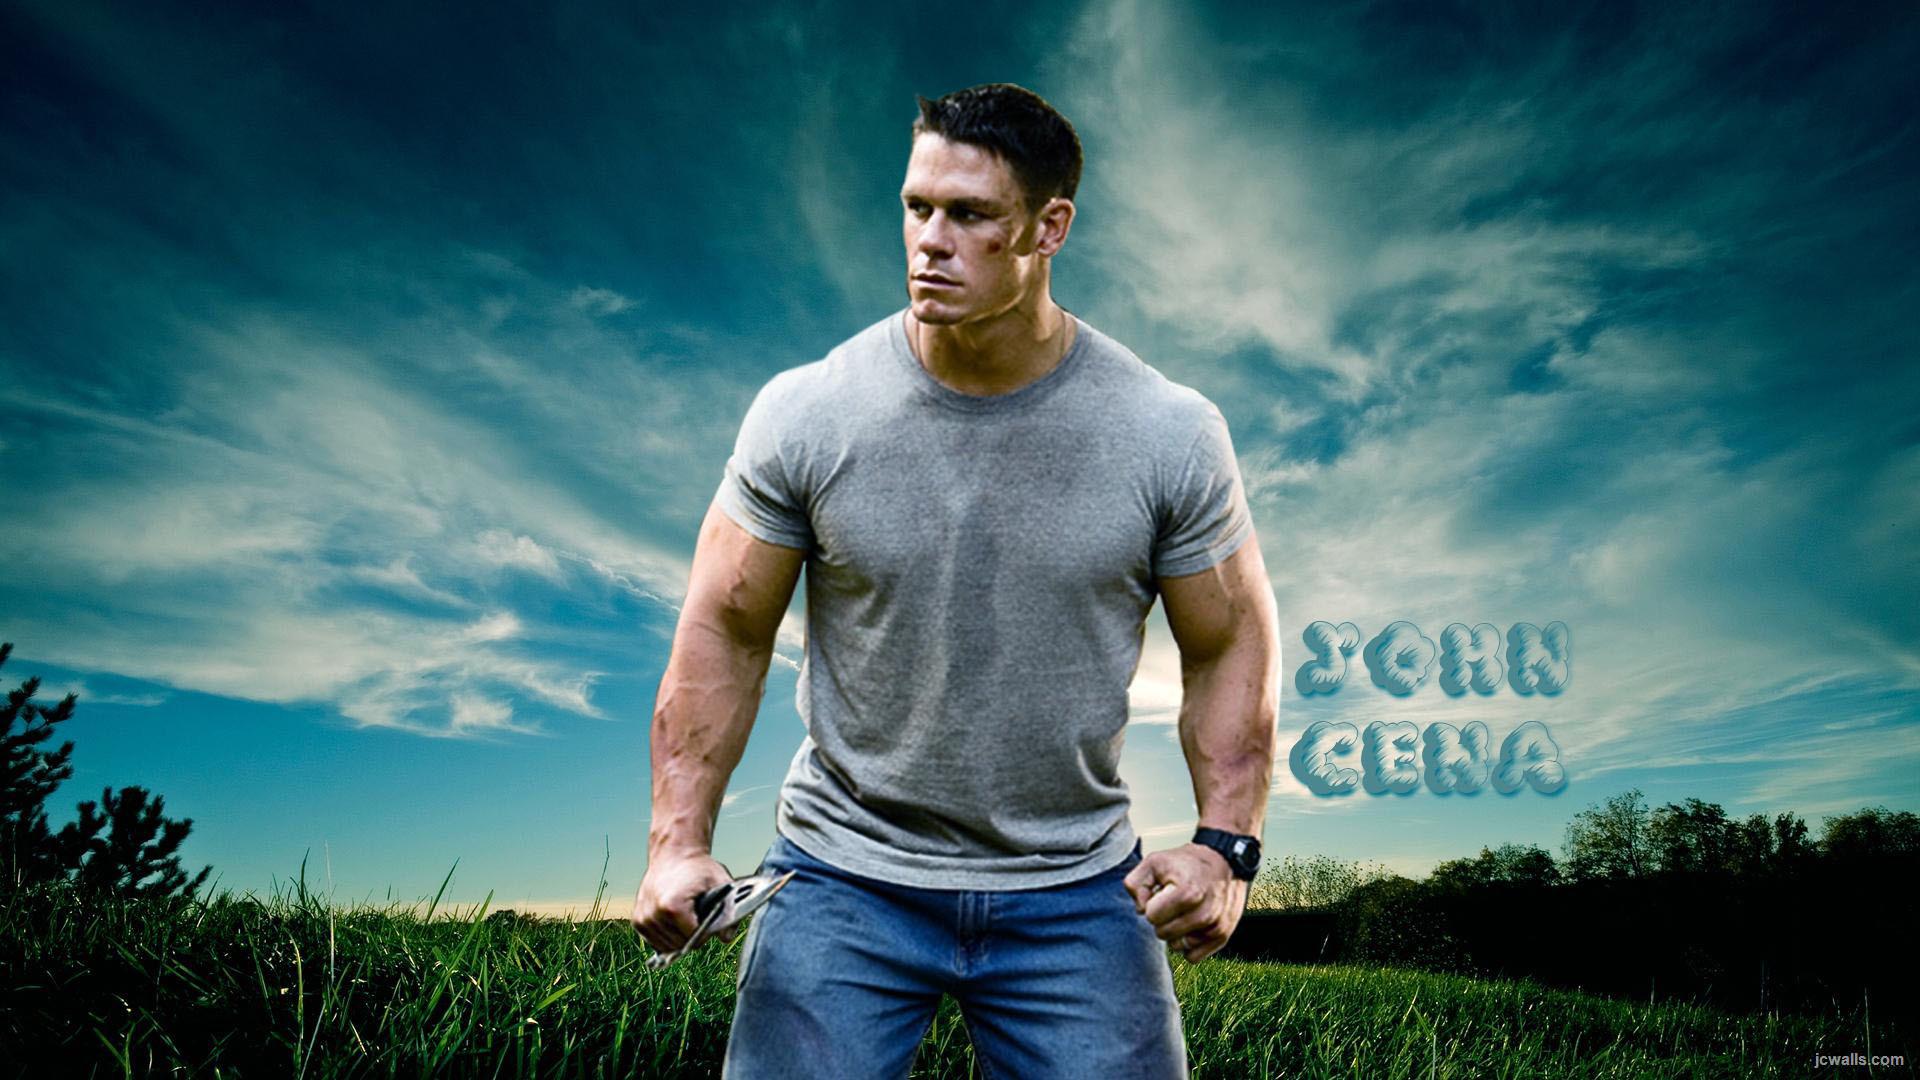 Images Of John Cena